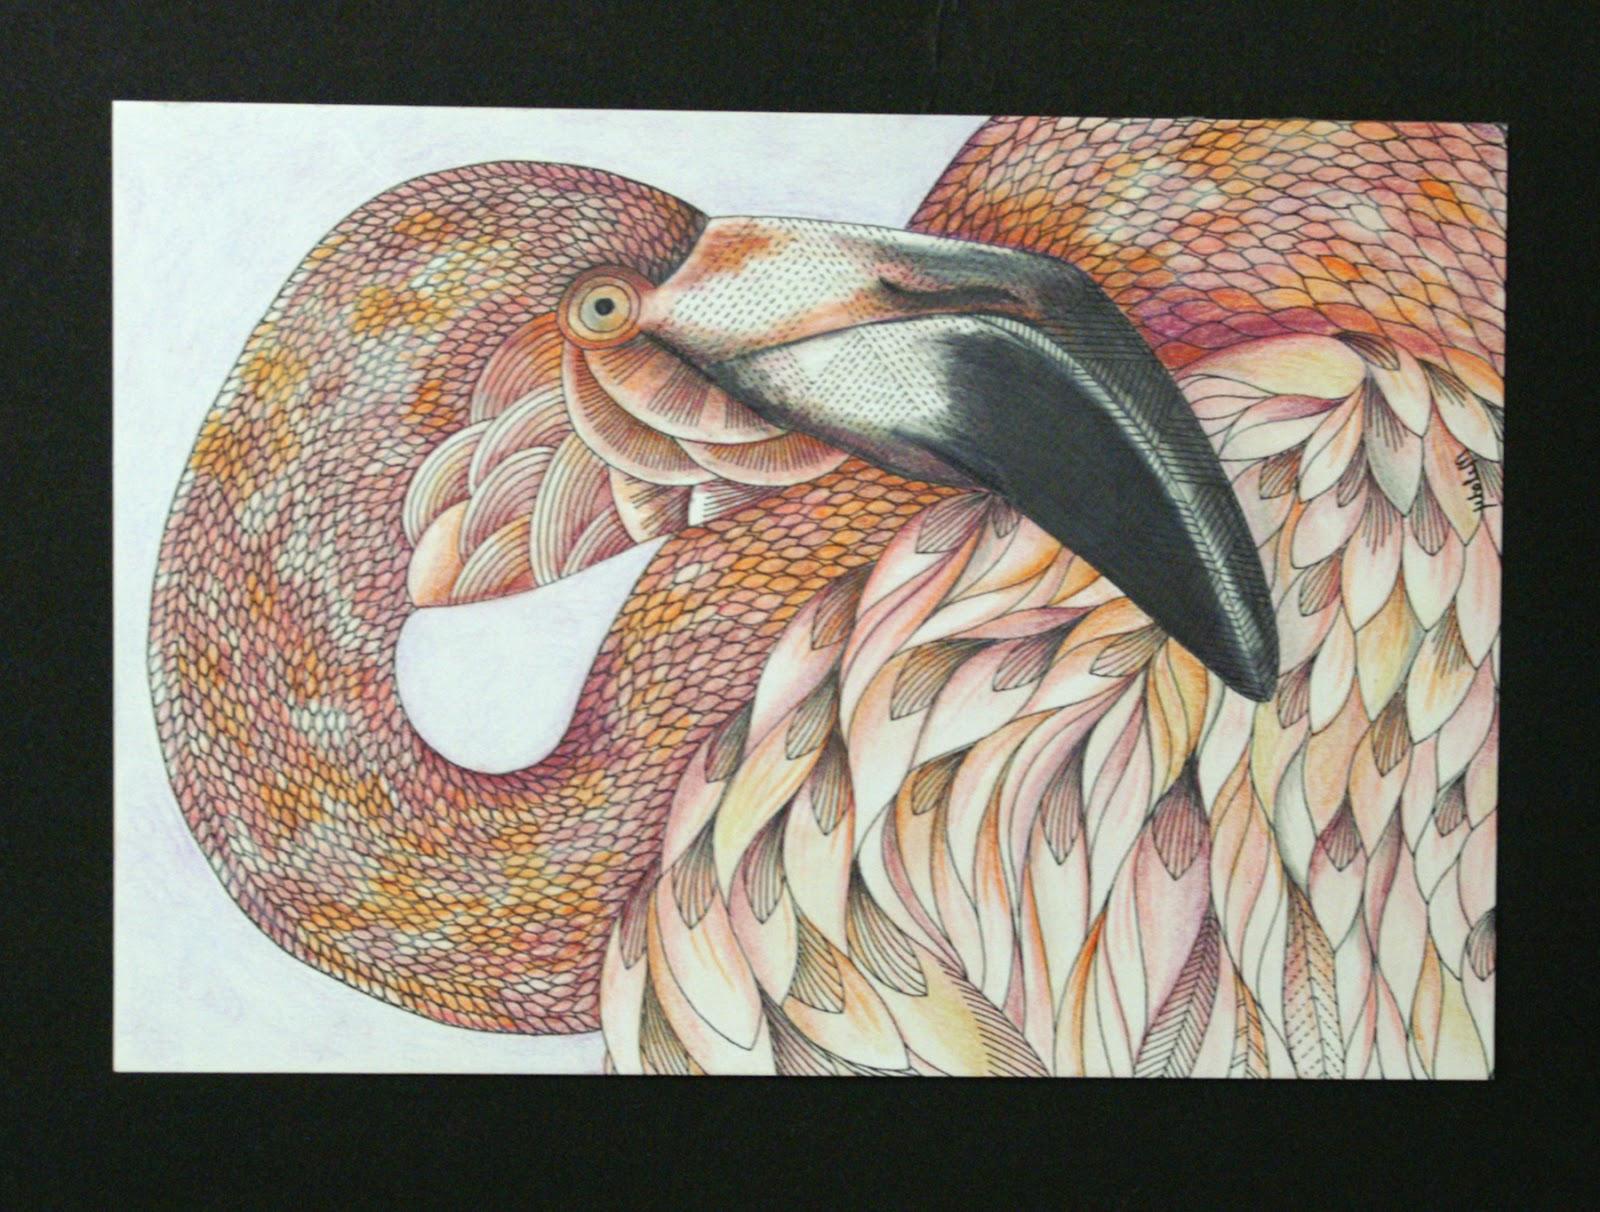 Animal Kingdom Colouring Book Finished Ben Franklin Crafts And Frame Adult